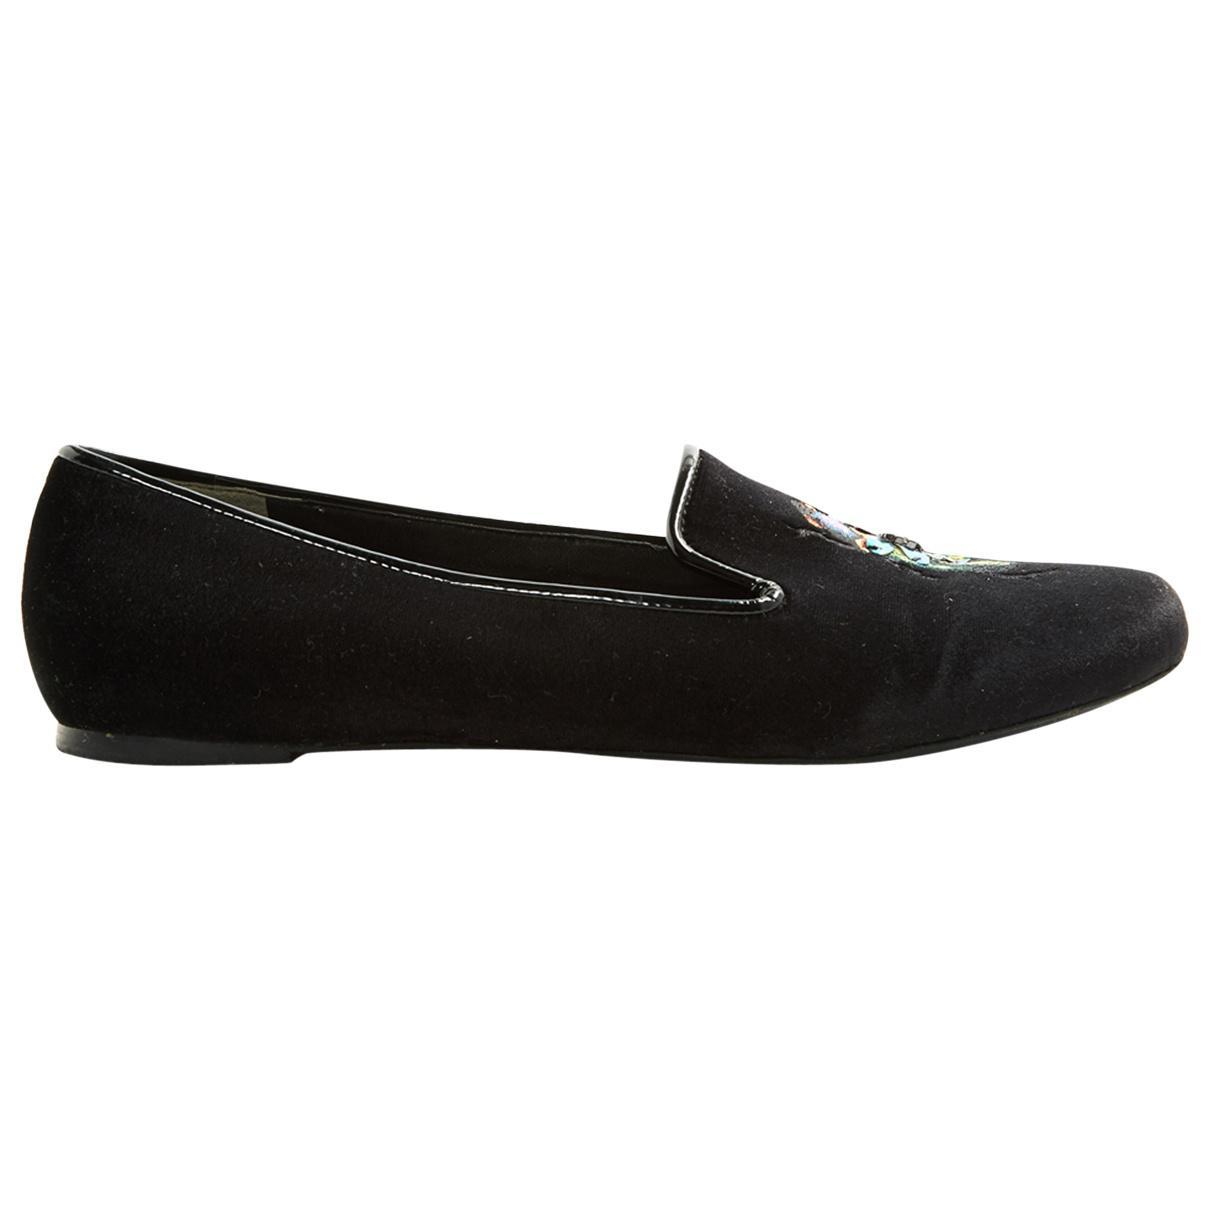 979c28627 Tory Burch. Women s Black Velvet Flats.  170  108 From Vestiaire Collective